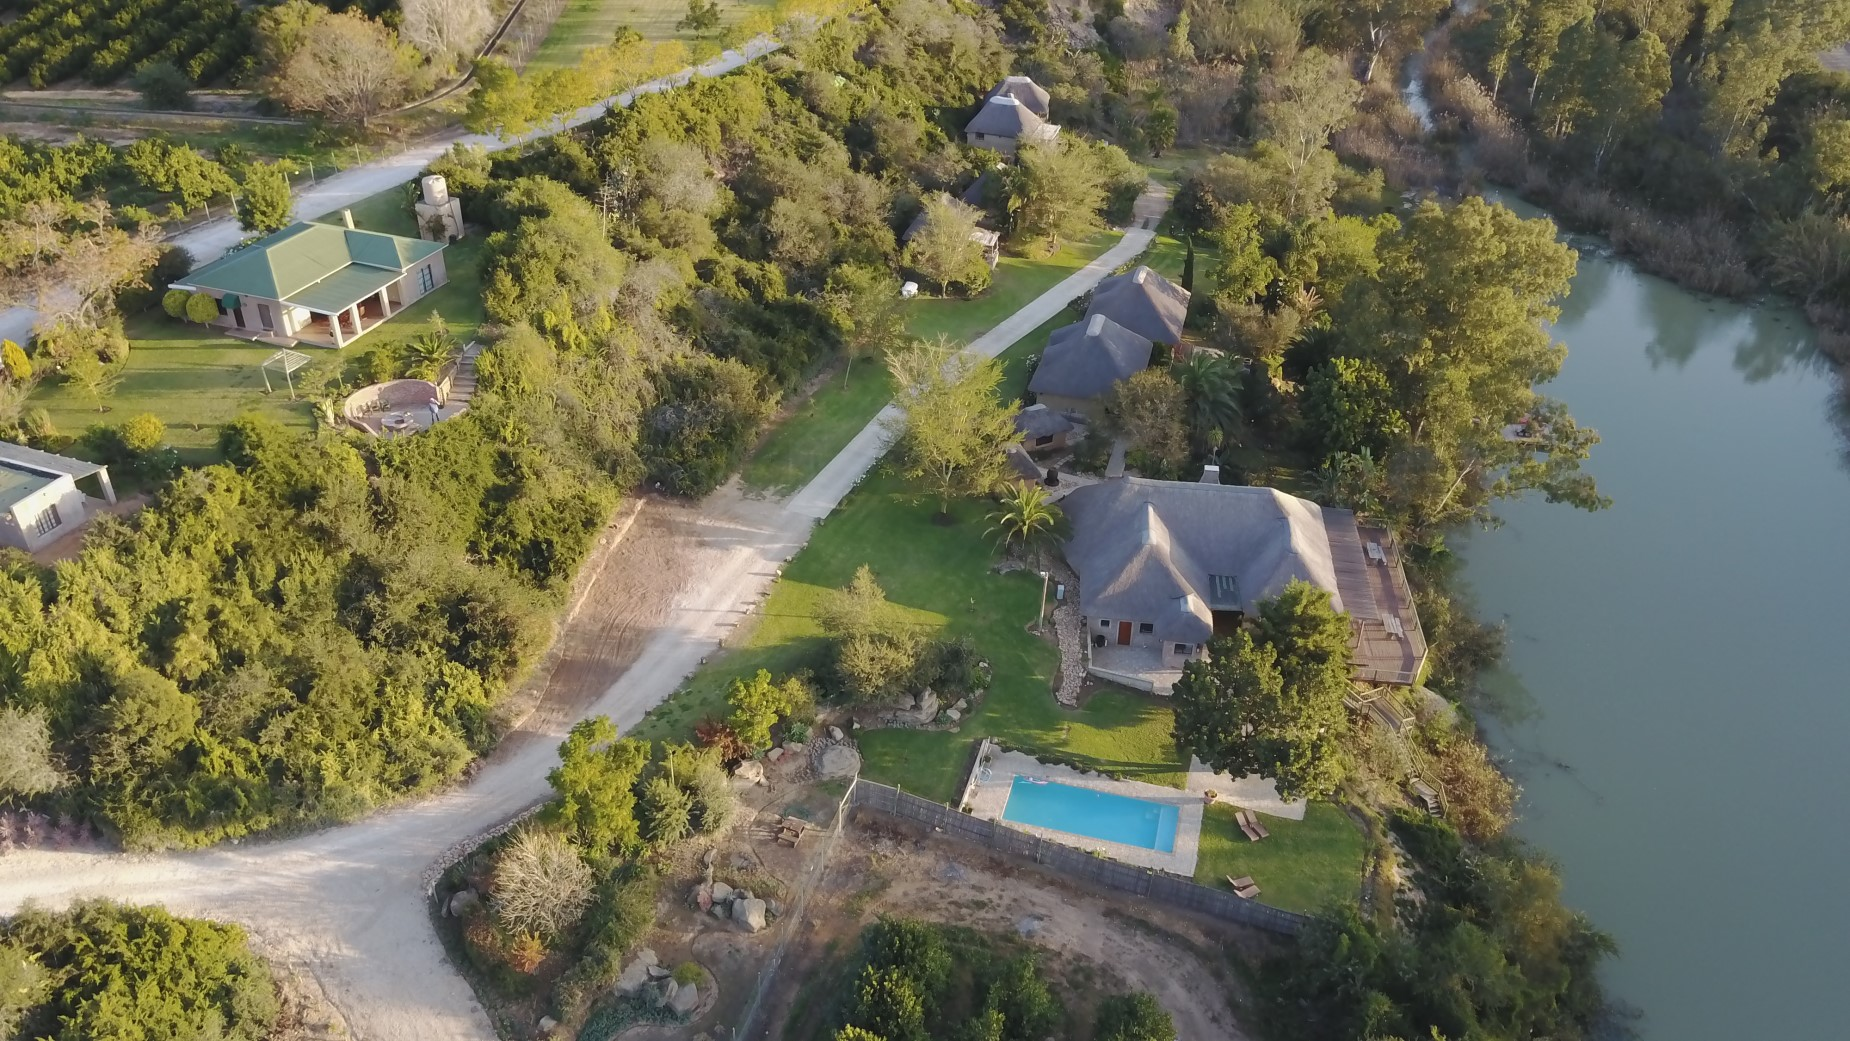 Aerial pic of Riverside Chalets _ Riverside Venue